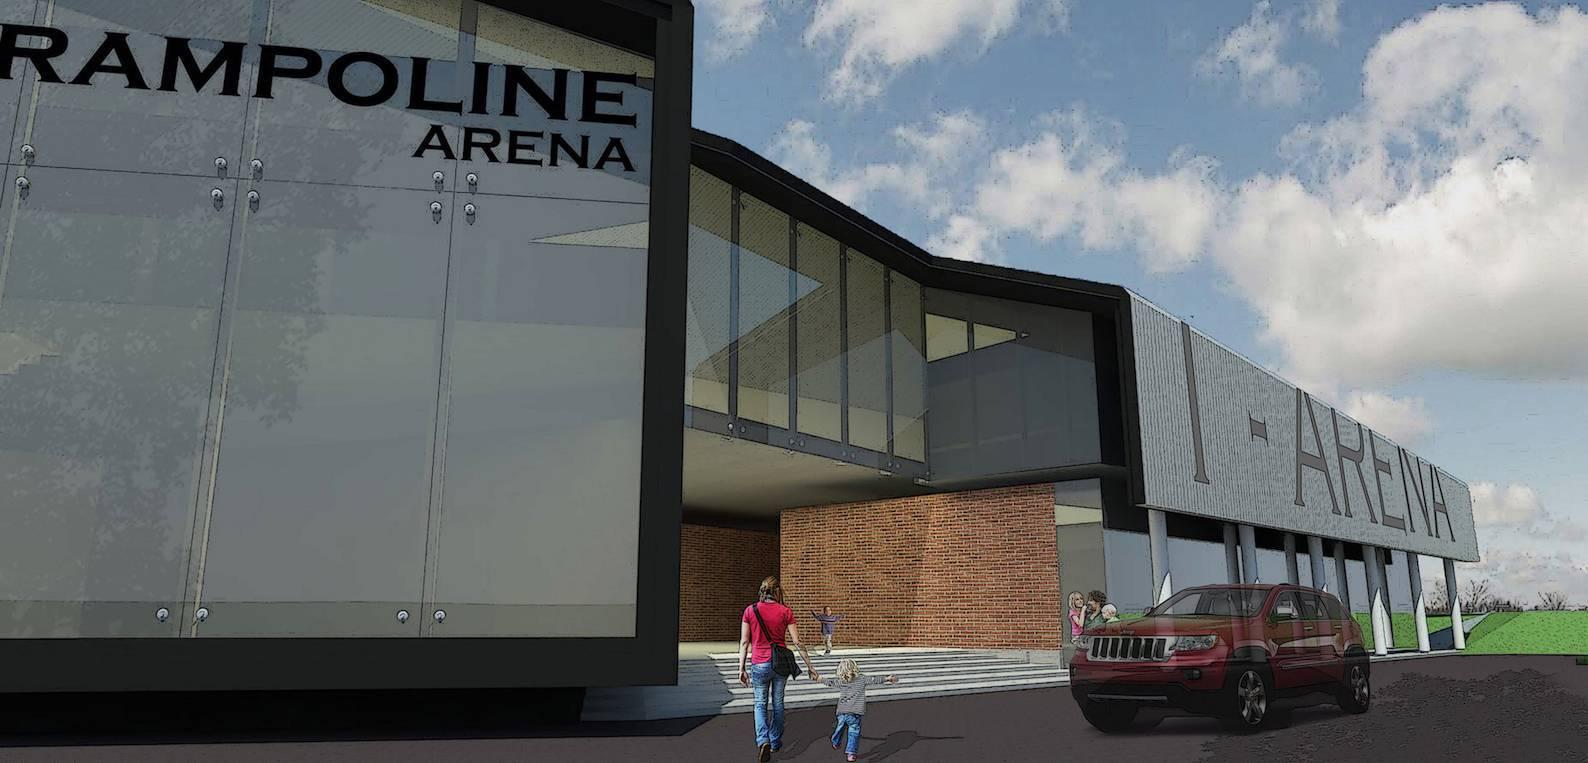 Monokroma Architect Trampoline Arena Serpong Serpong Drop Off Area Modern  589